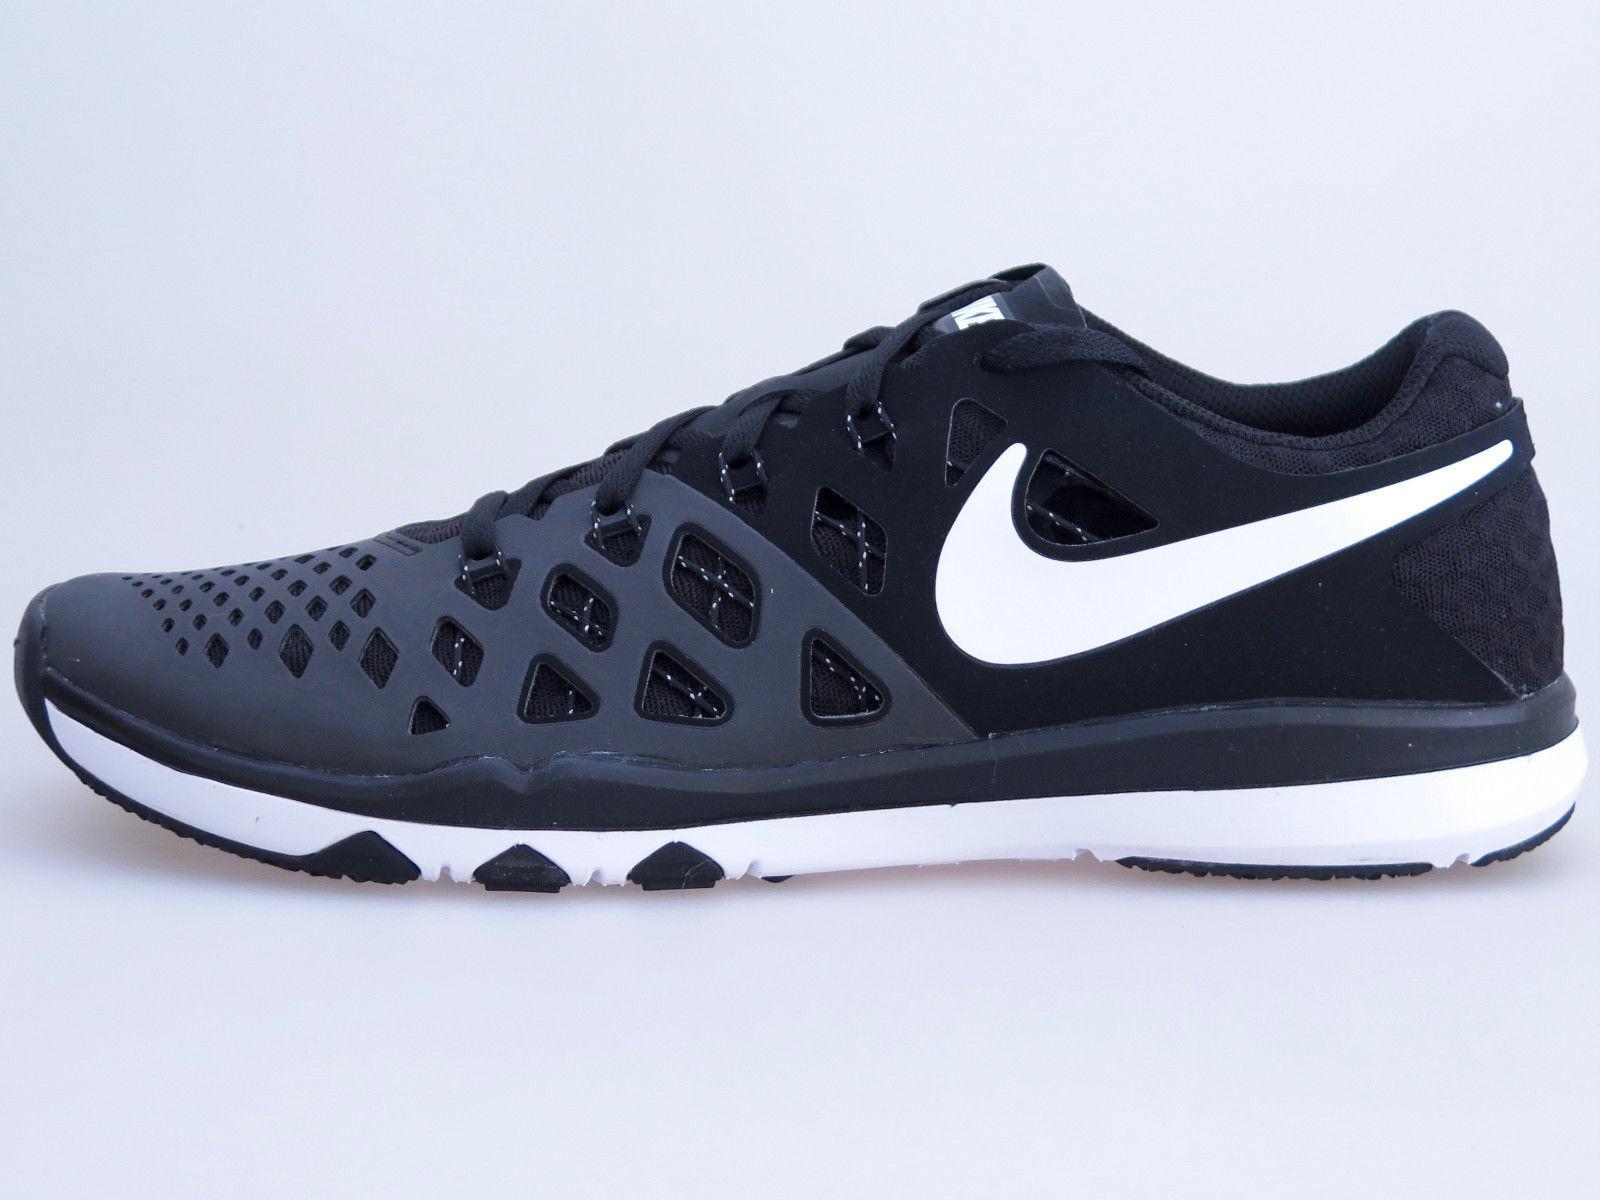 Nike Train Speed 4 black white 843937-010